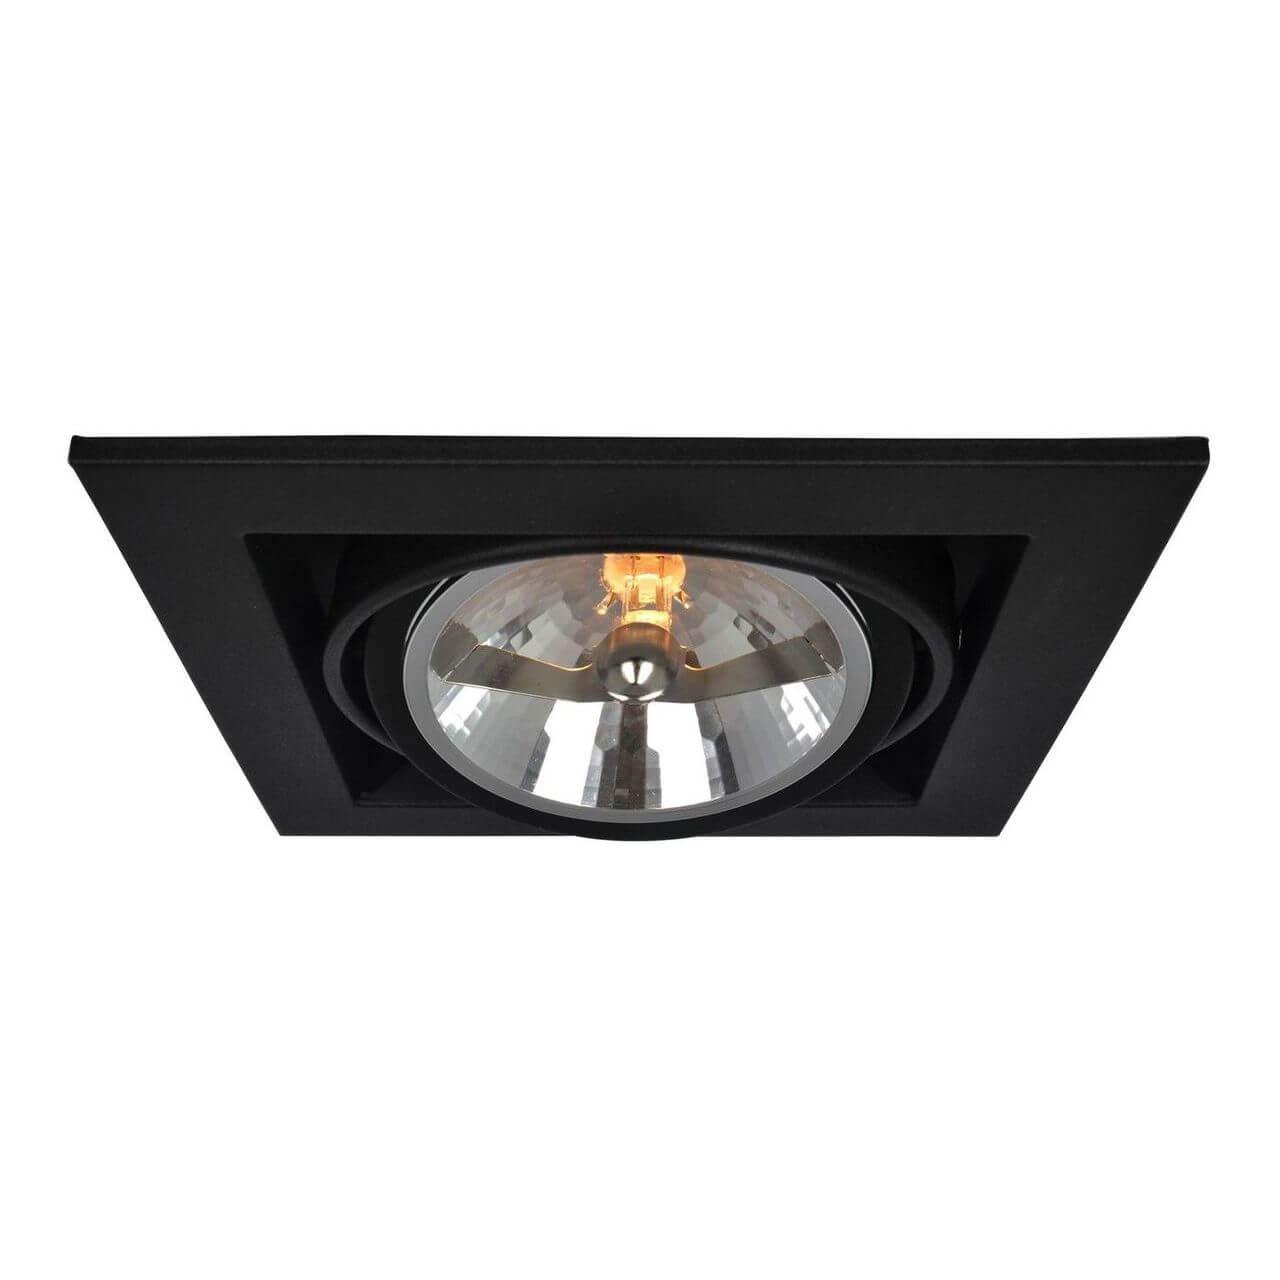 Светильник Arte Lamp A5935PL-1BK Cardani Black цена 2017